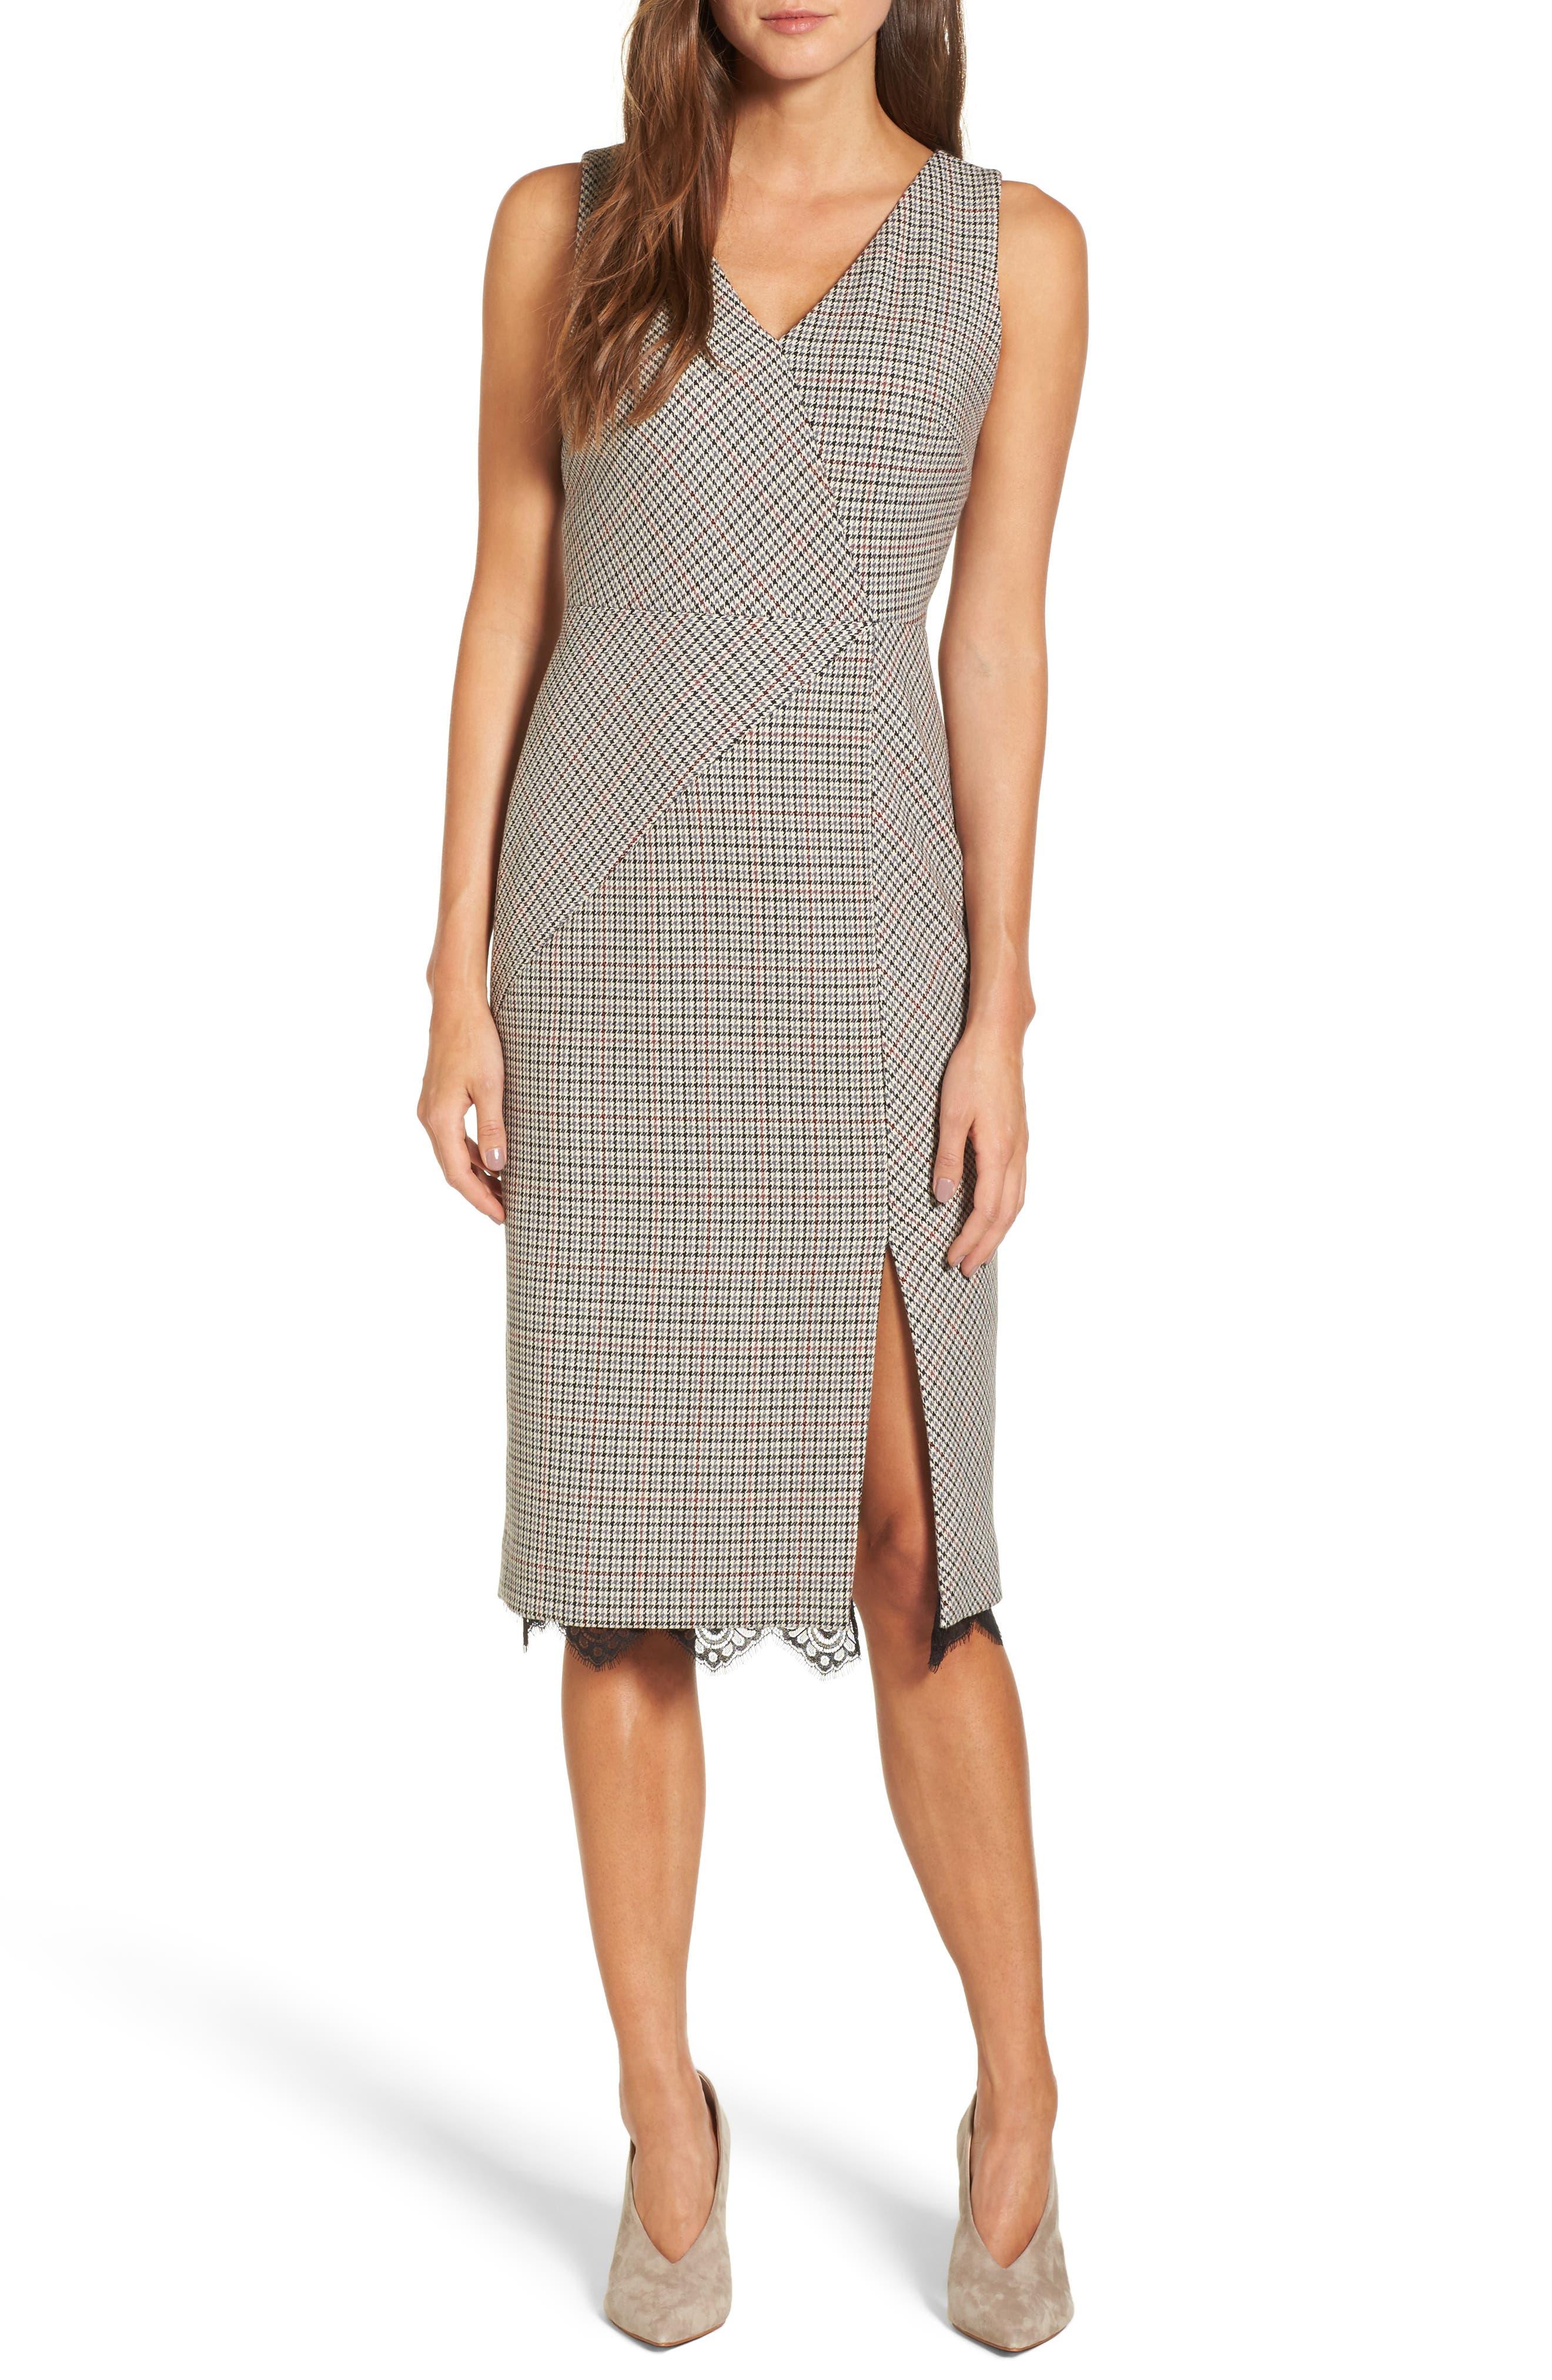 Houndstooth Sheath Dress, Main, color, 270